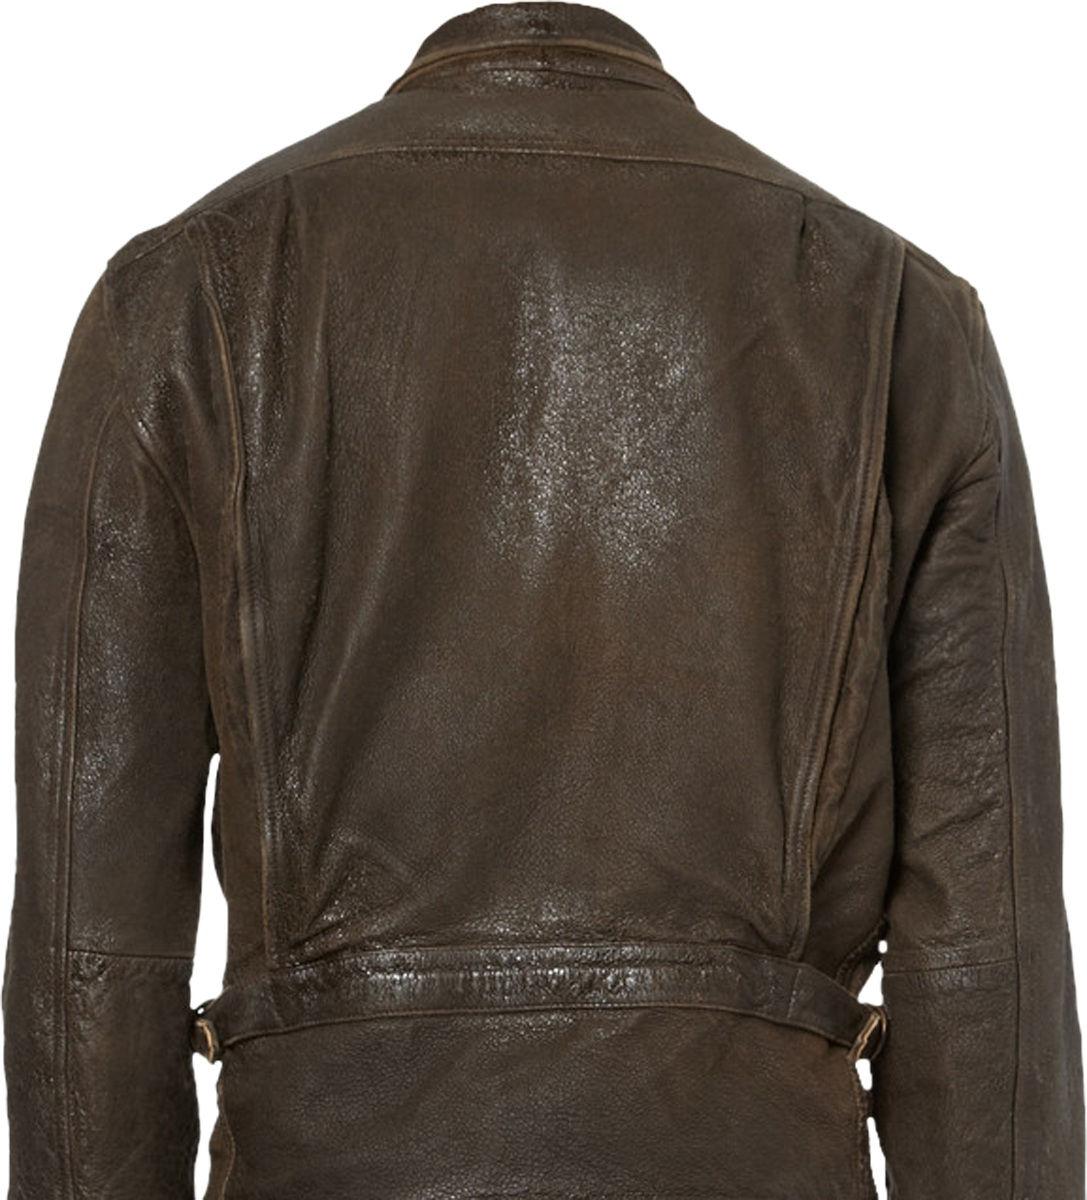 James Bond Skyfall Distressed Leather Jacket - Unfinished Man